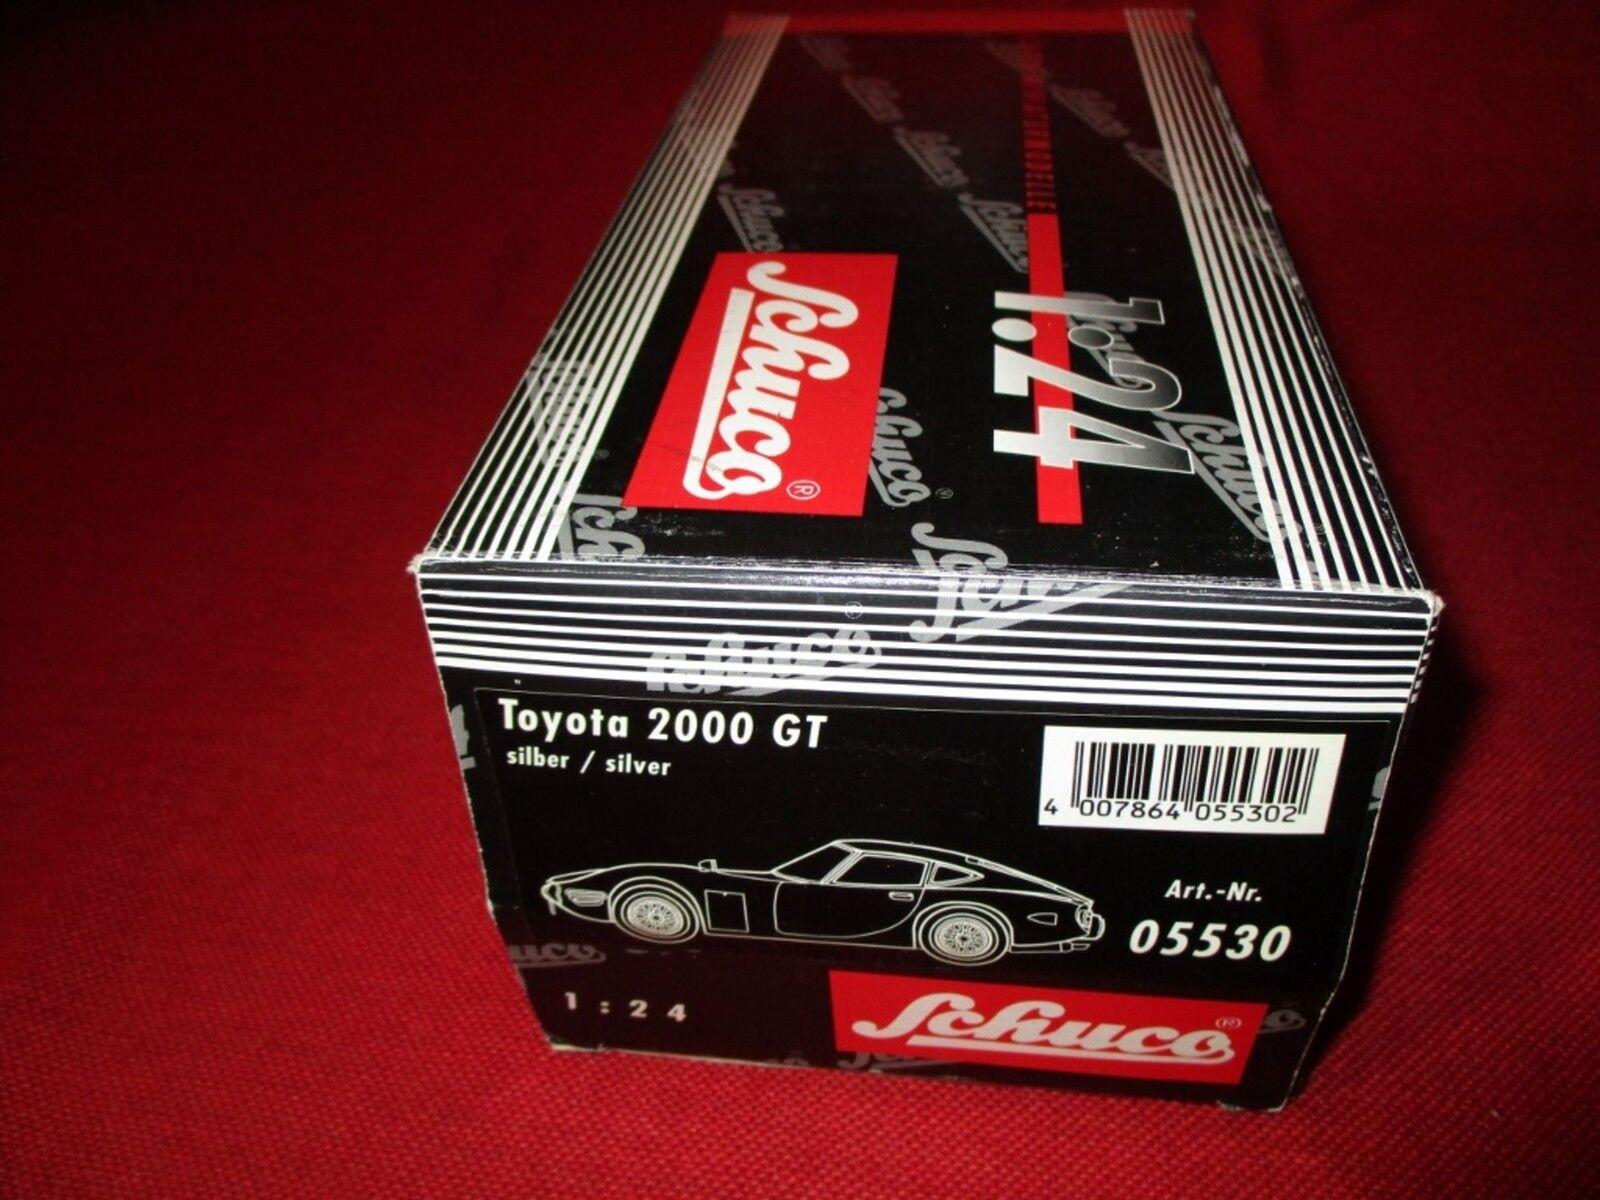 Schuco ® 05530 1 24 TOYOTA 2000 GT Neuf neuf dans sa boîte